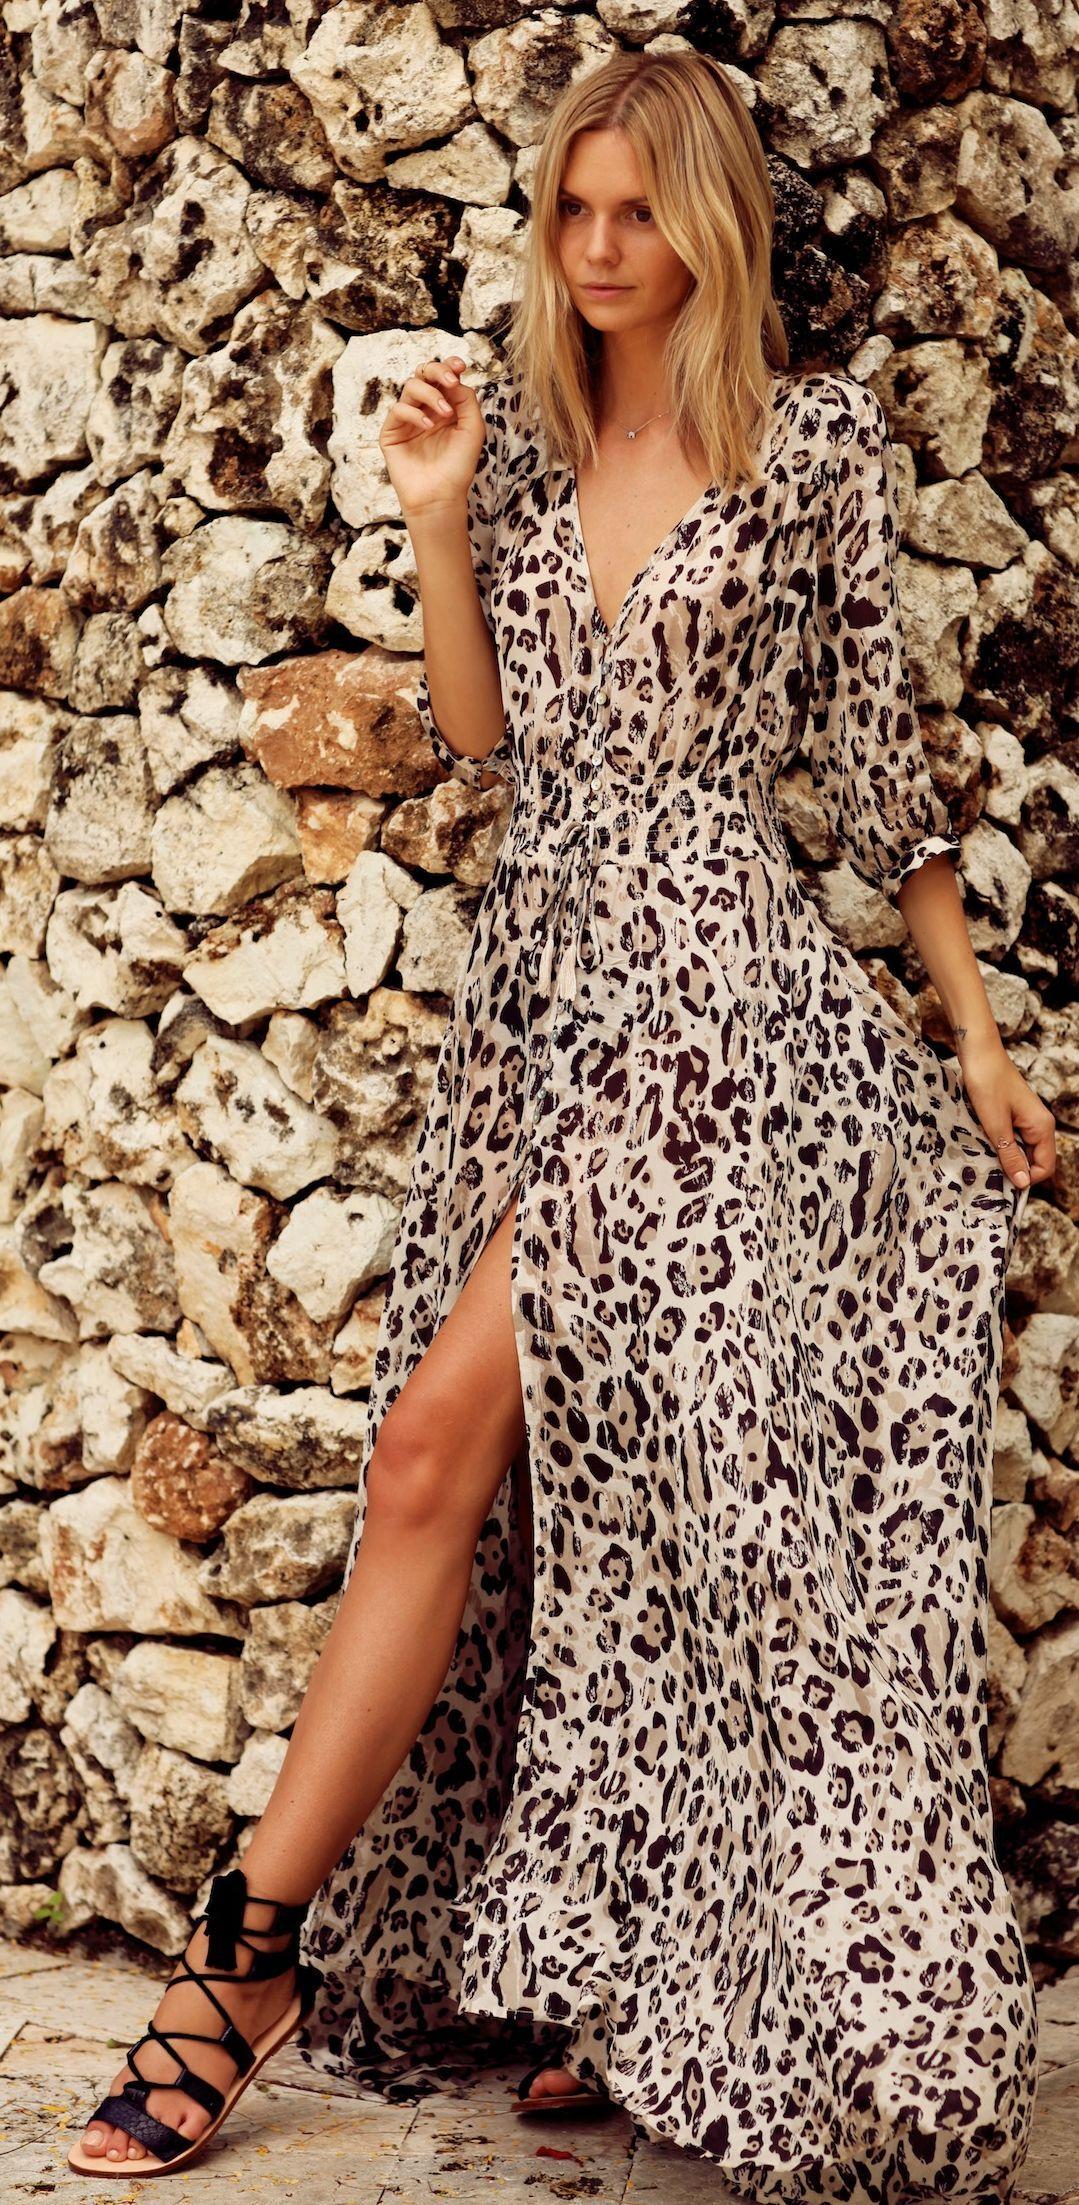 Animal Print Magnetism Inspiration Dress By Tuula